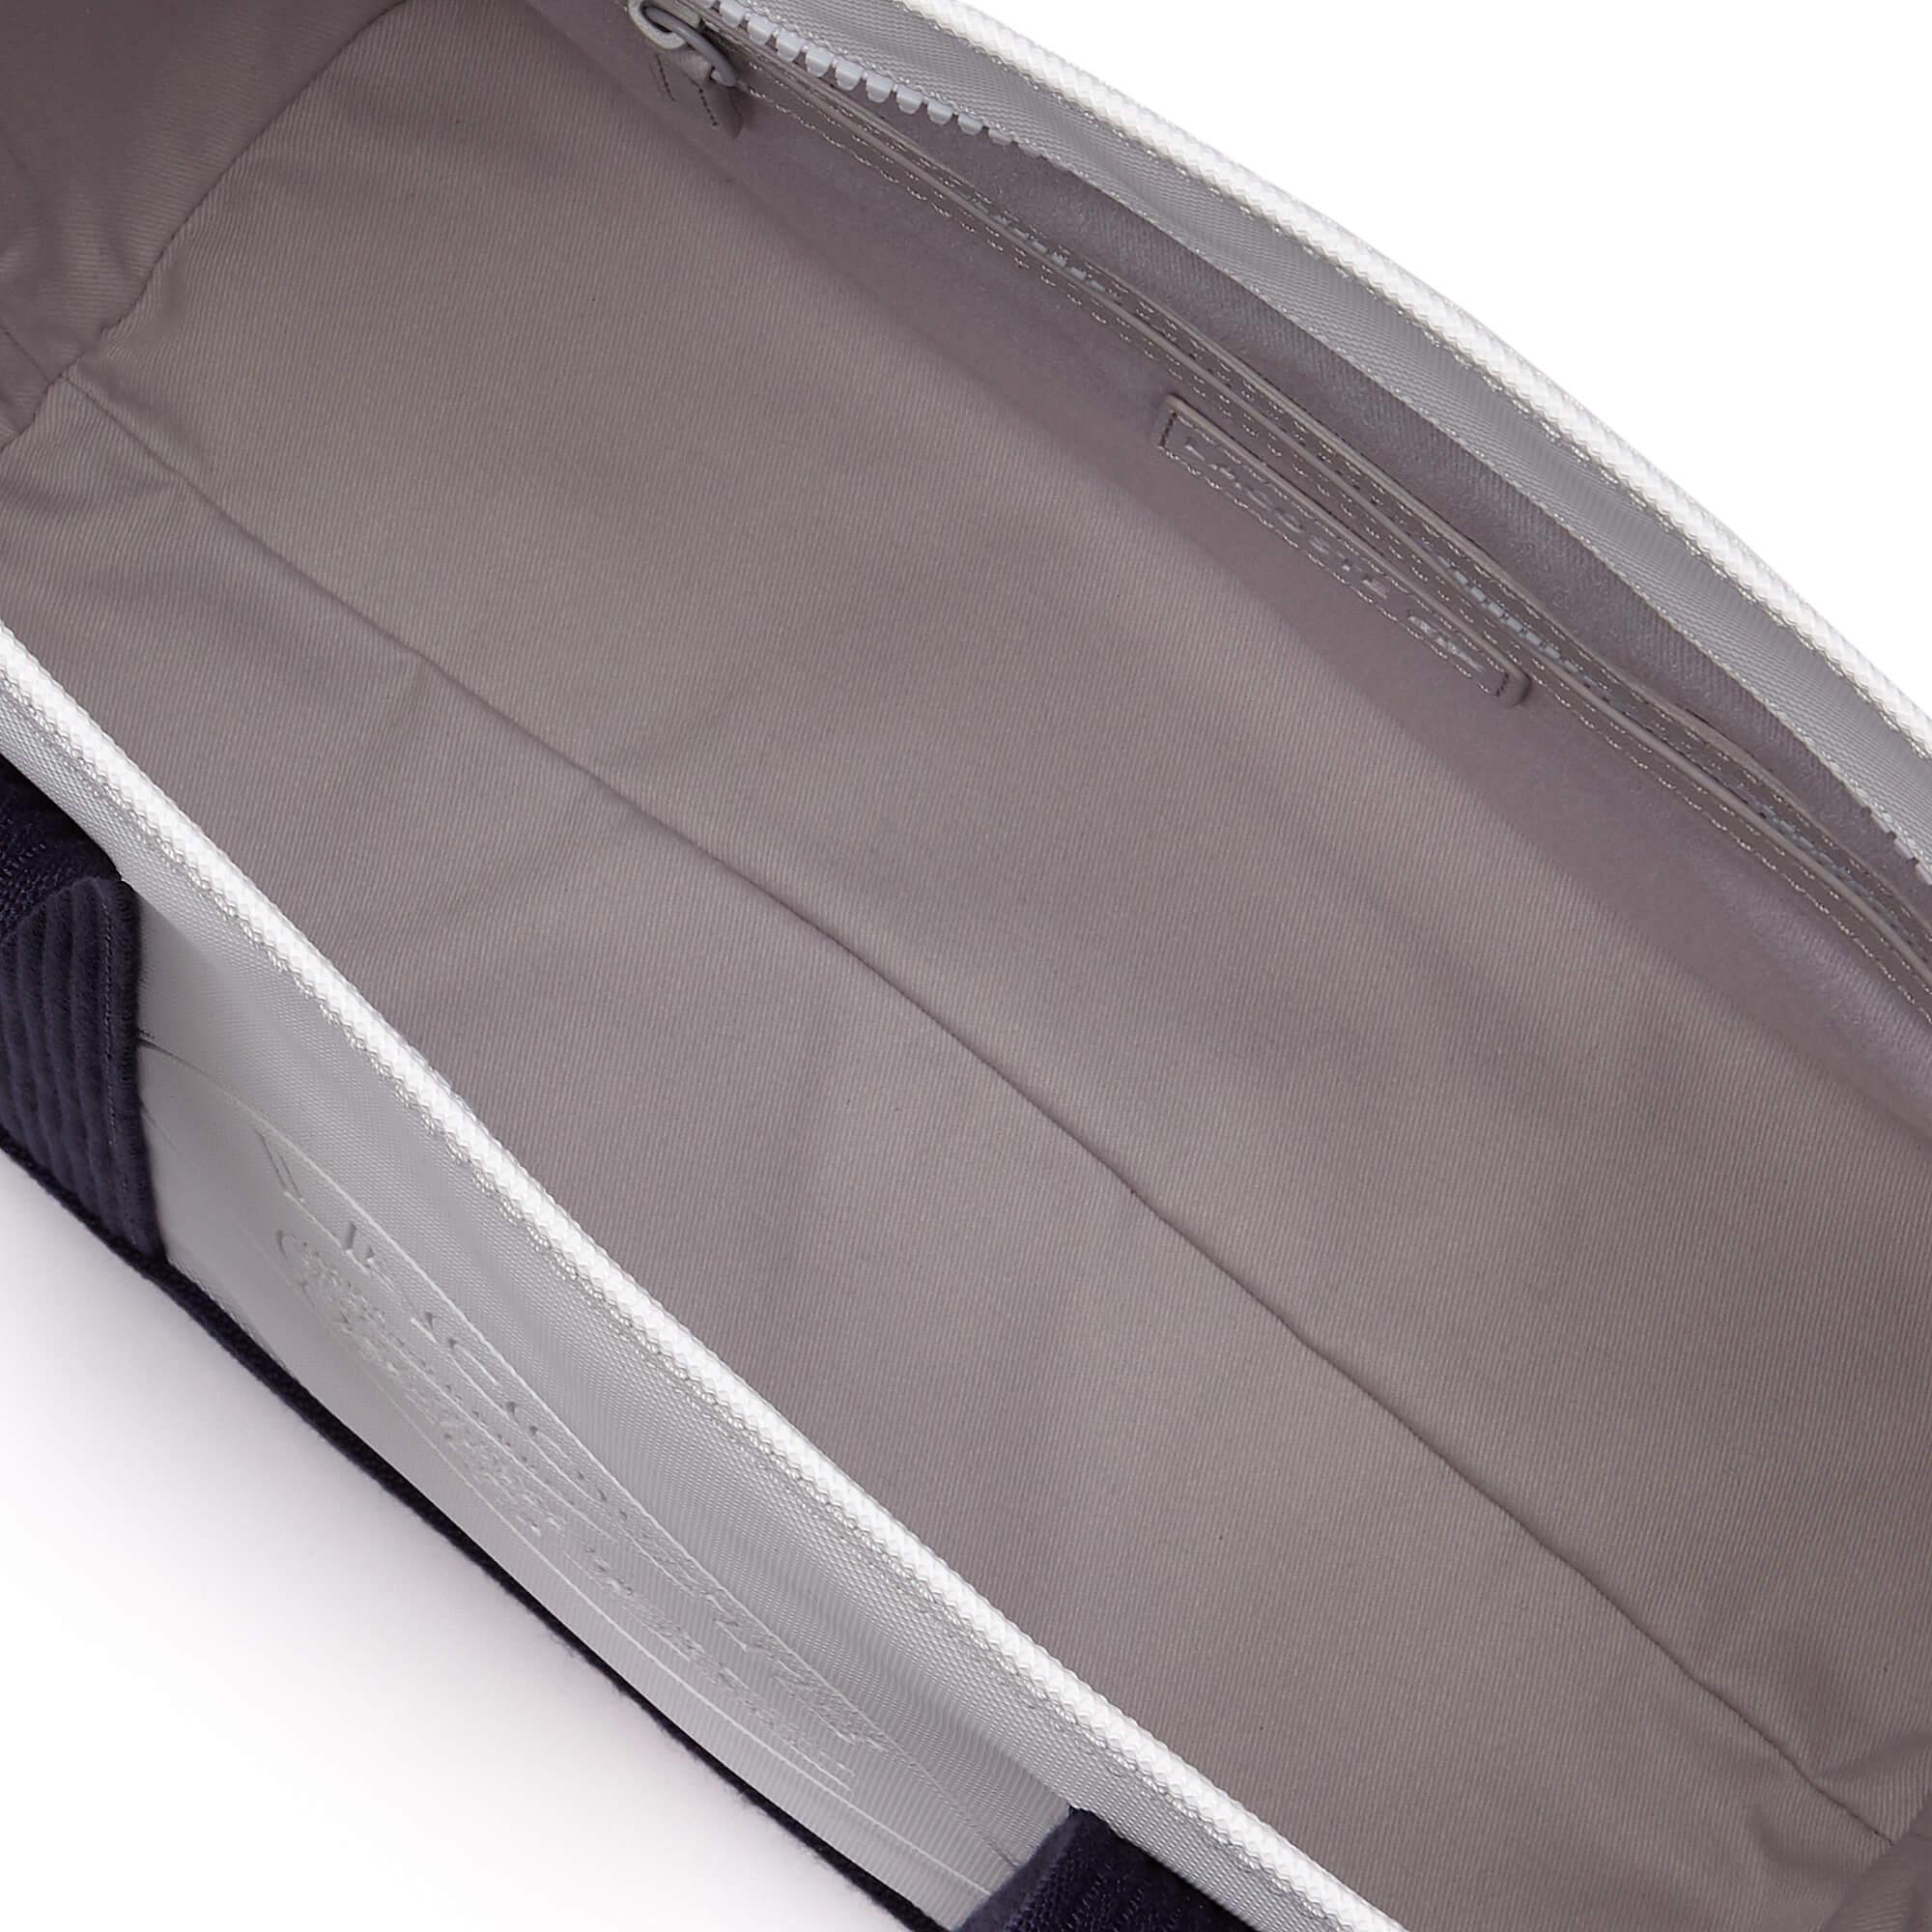 Lacoste Women's Classic Coated Piqué Canvas Zip Tote Bag